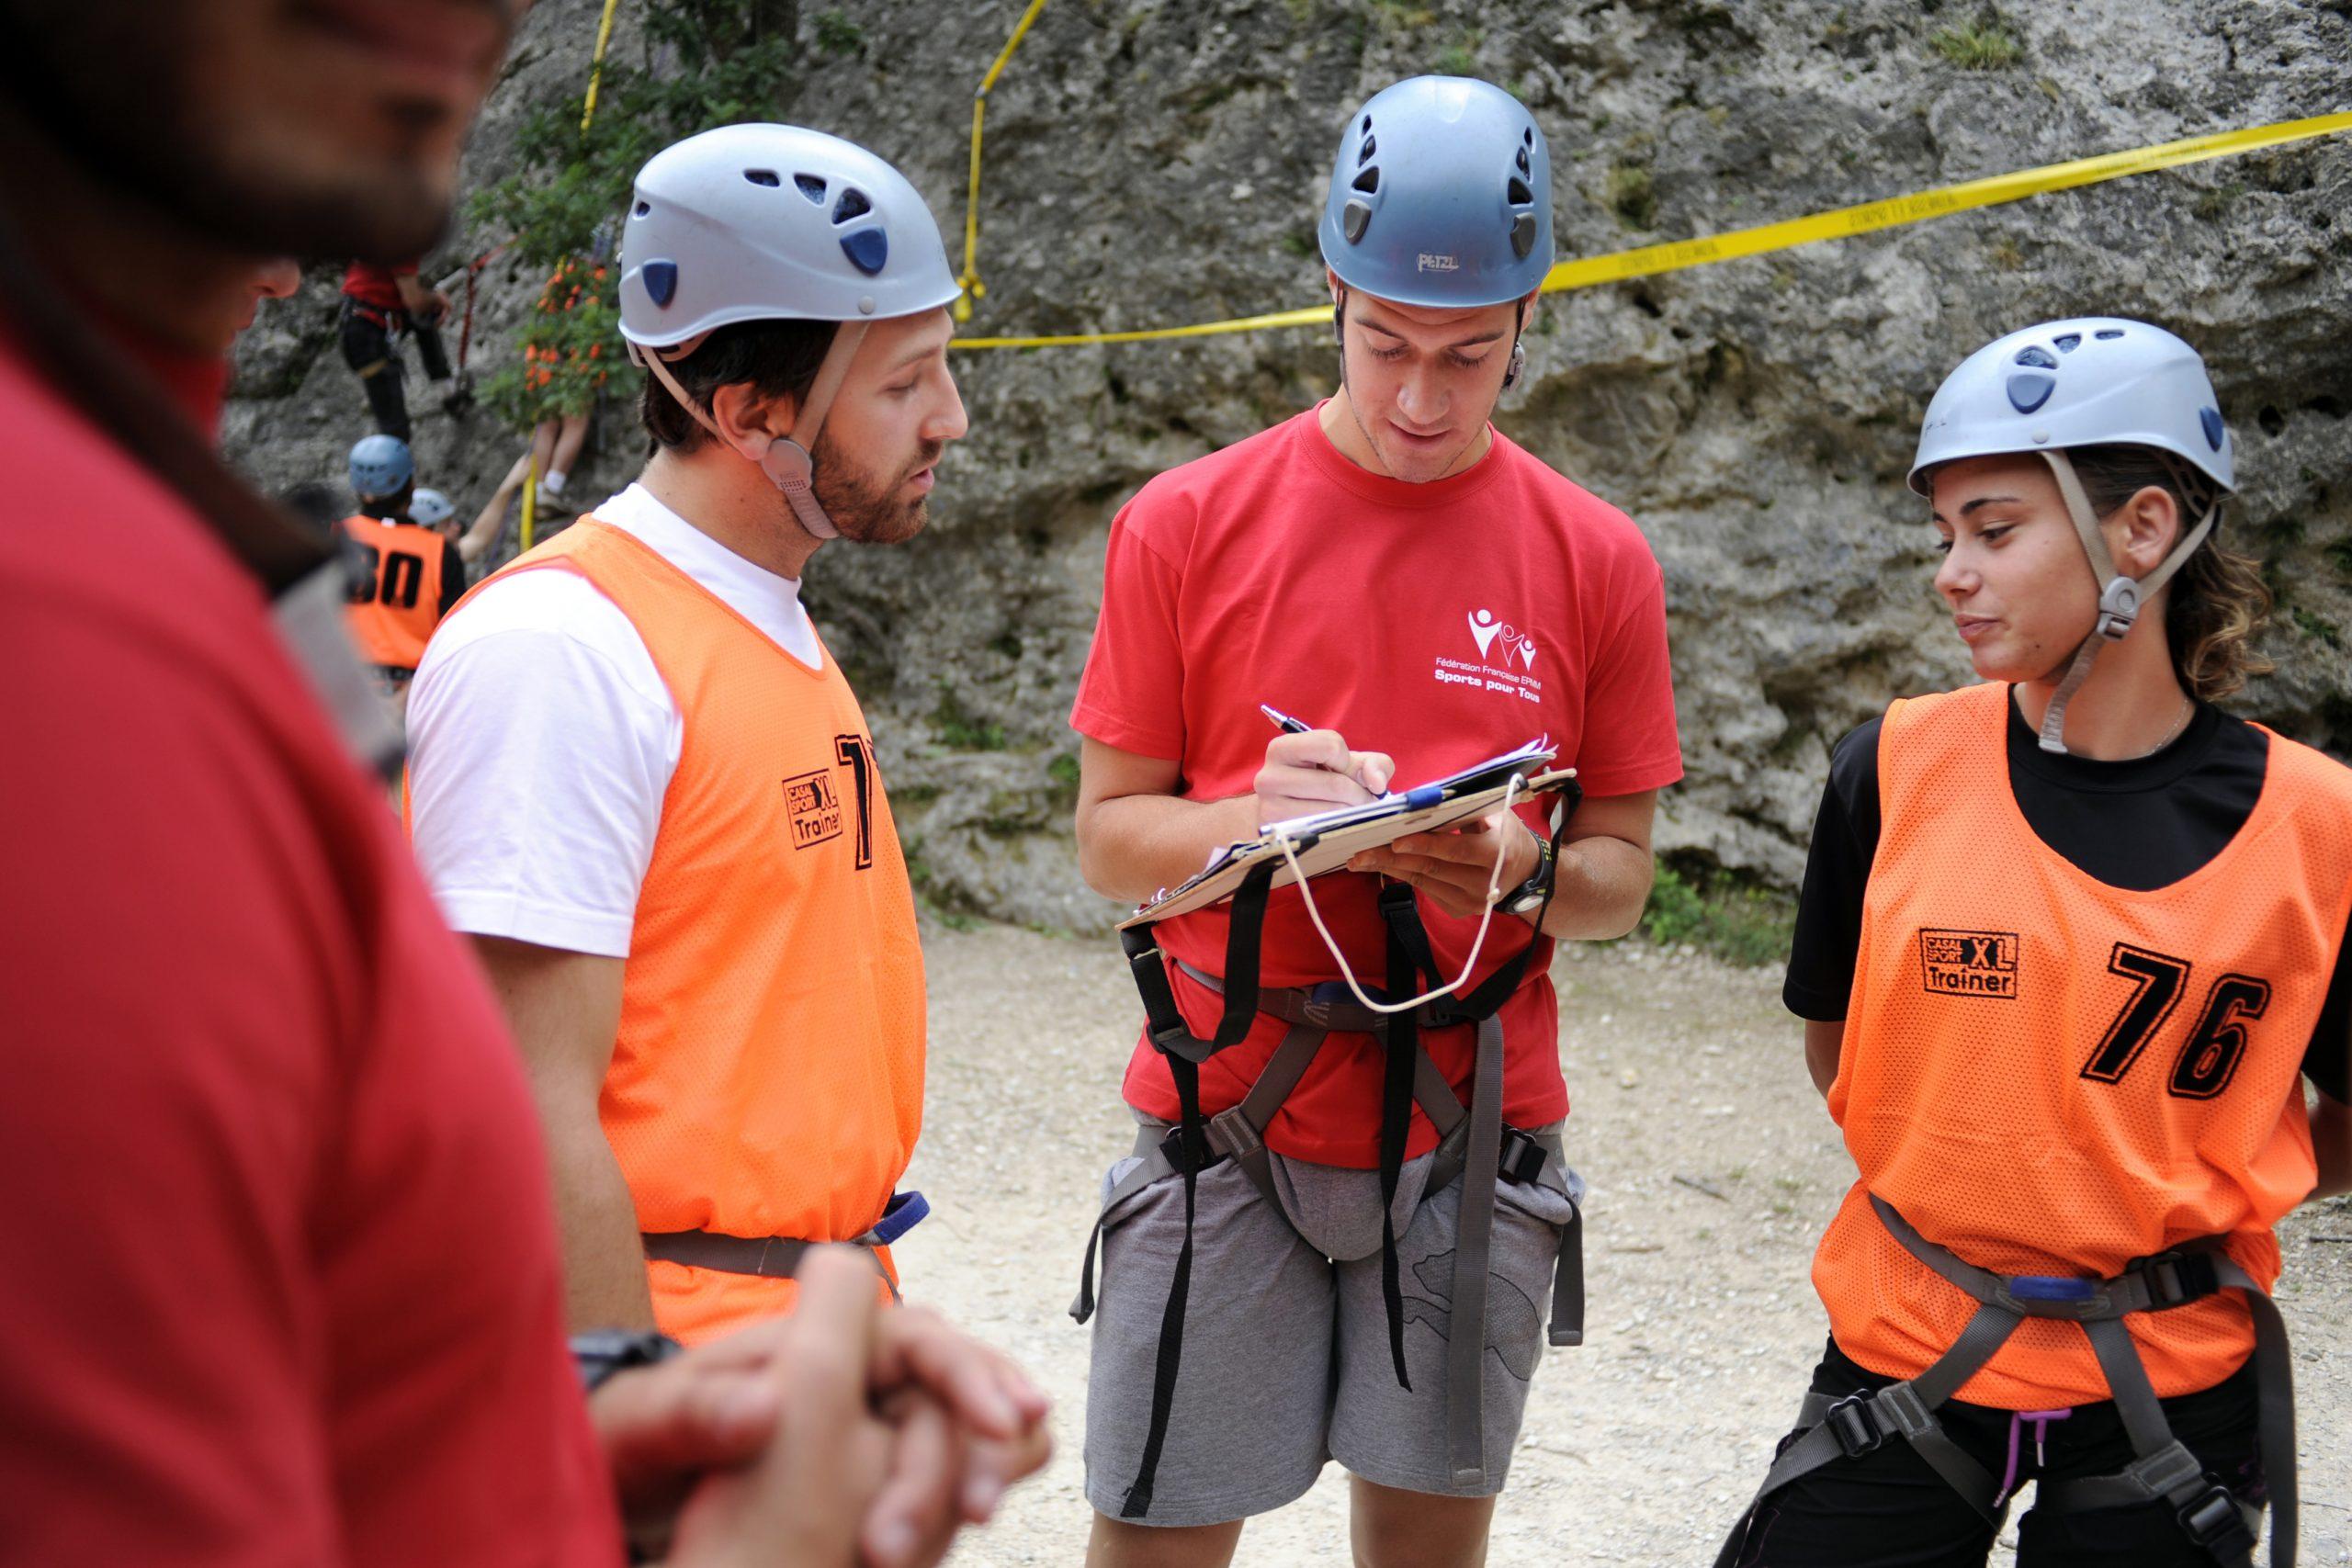 Photos d'adeptes de l'escalade de Sports Pour Tous